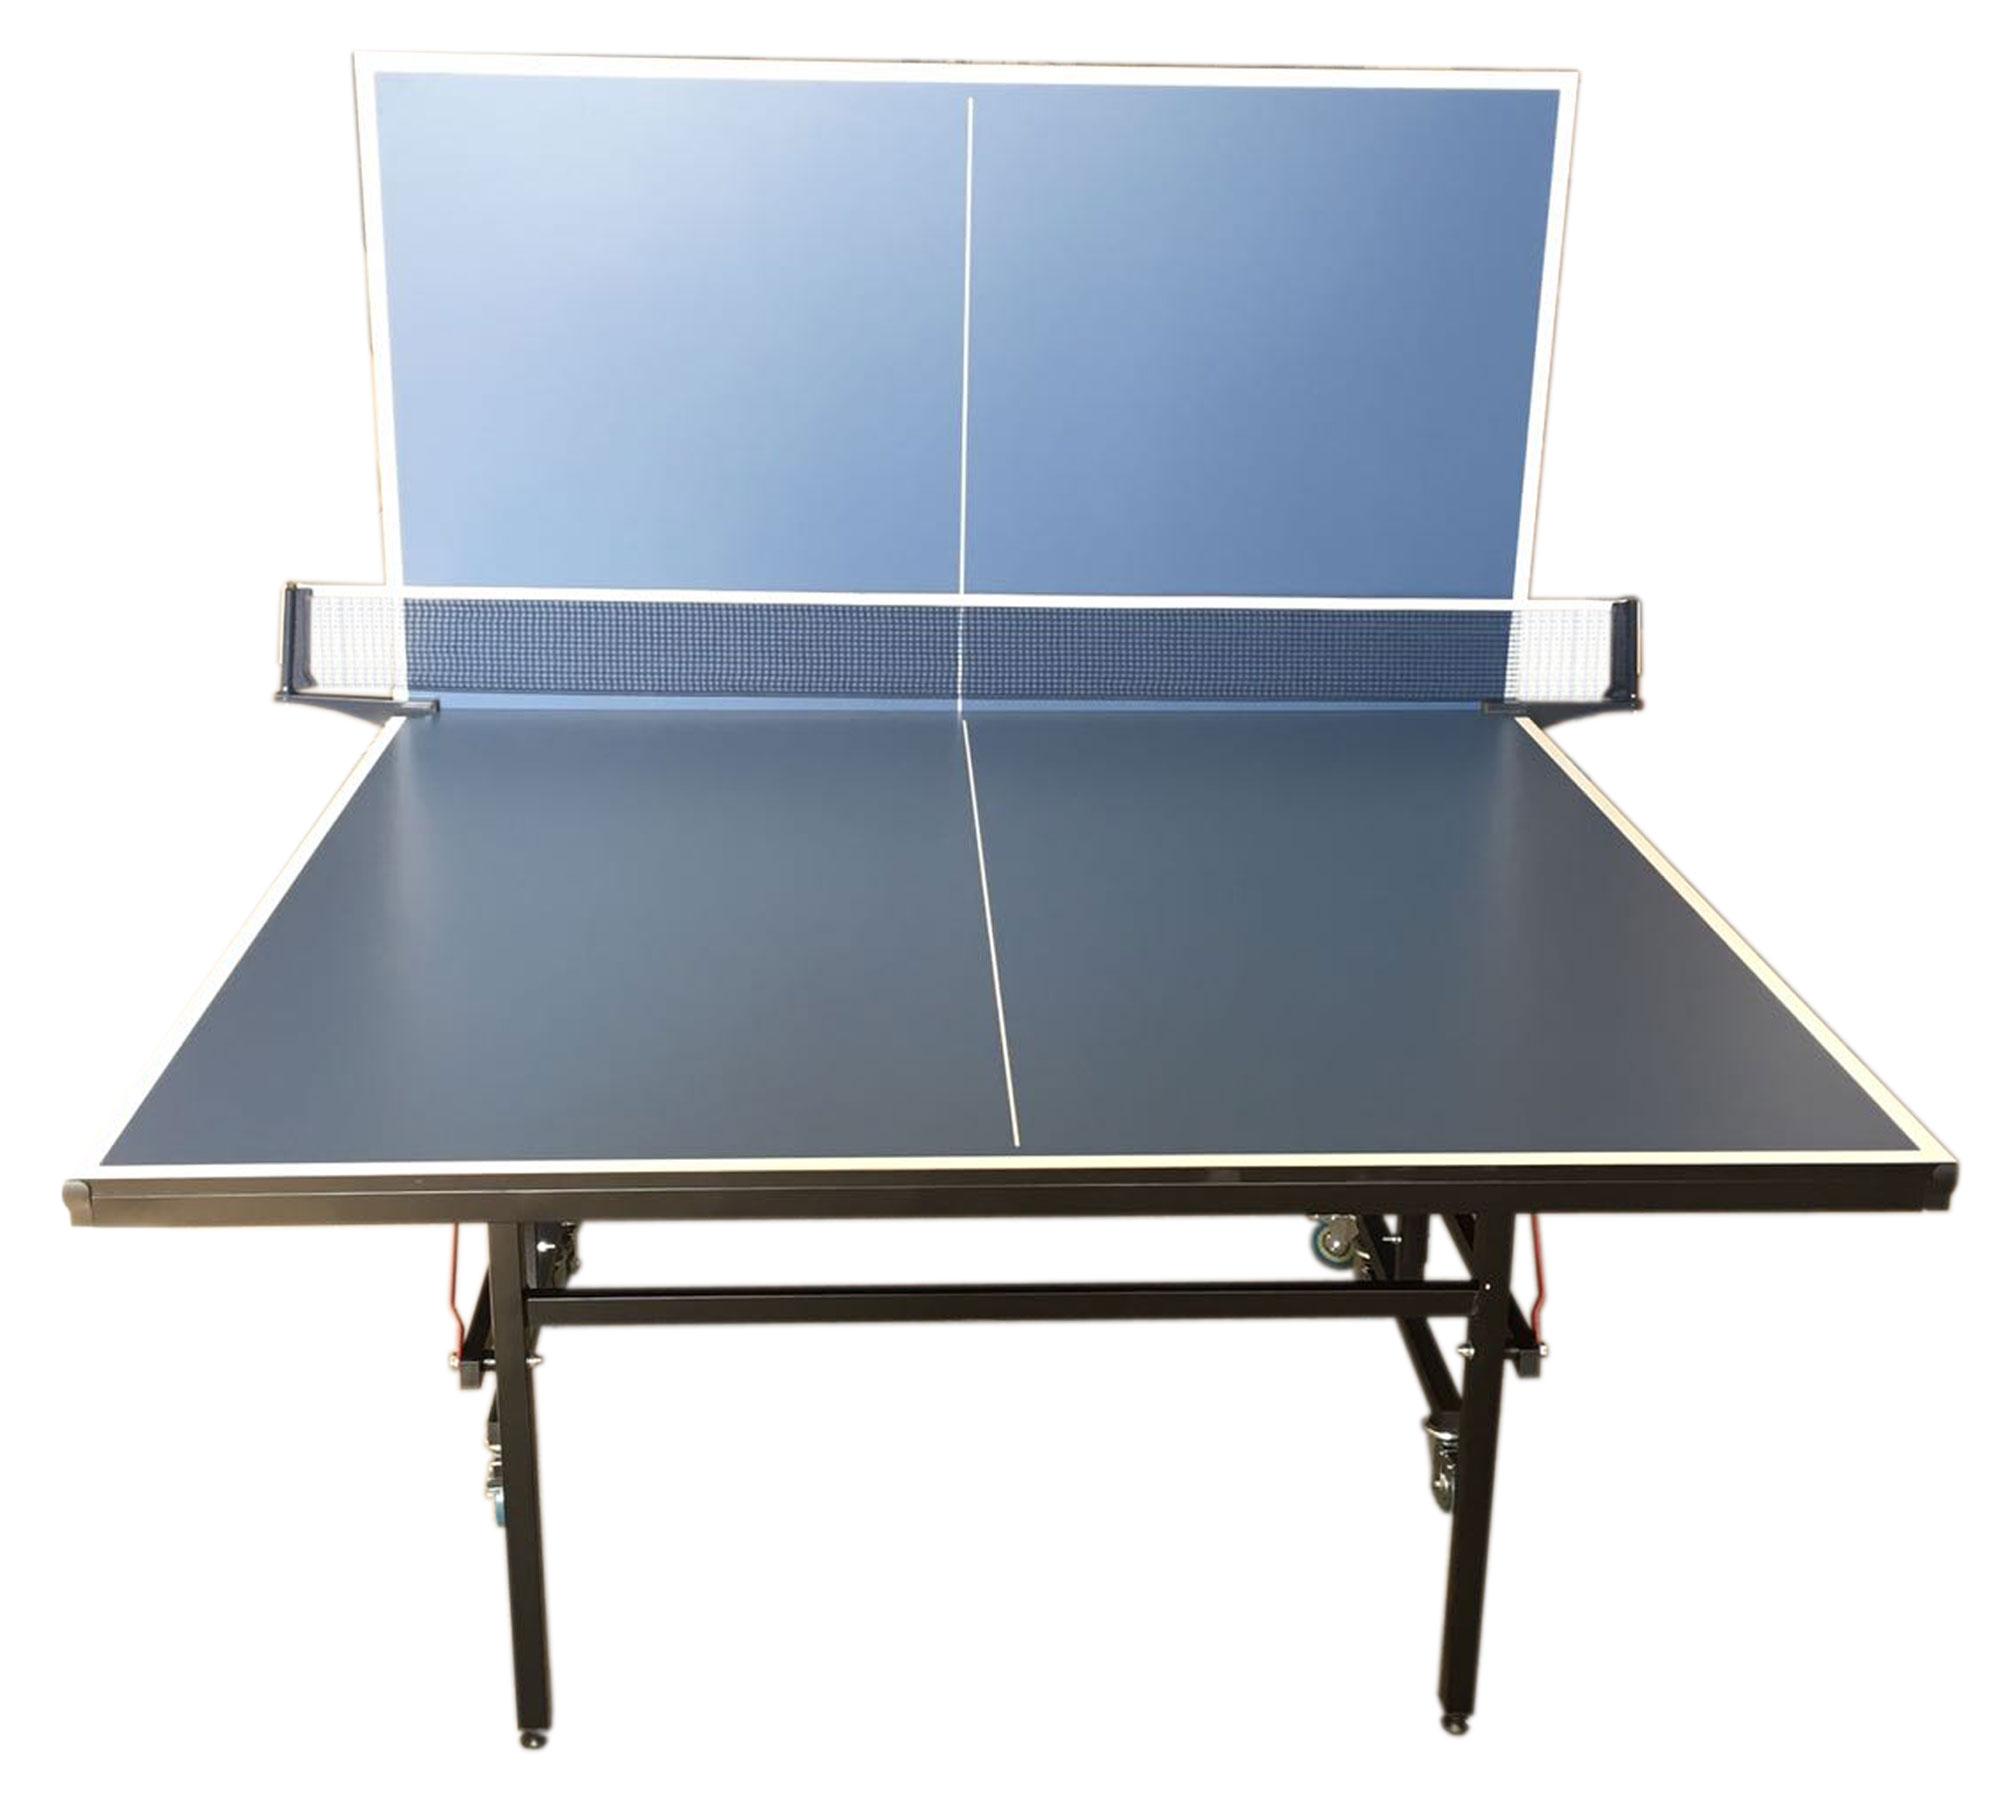 Tavolo ping pong professionale tennis da tavolo blue con - Tavolo da ping pong ...